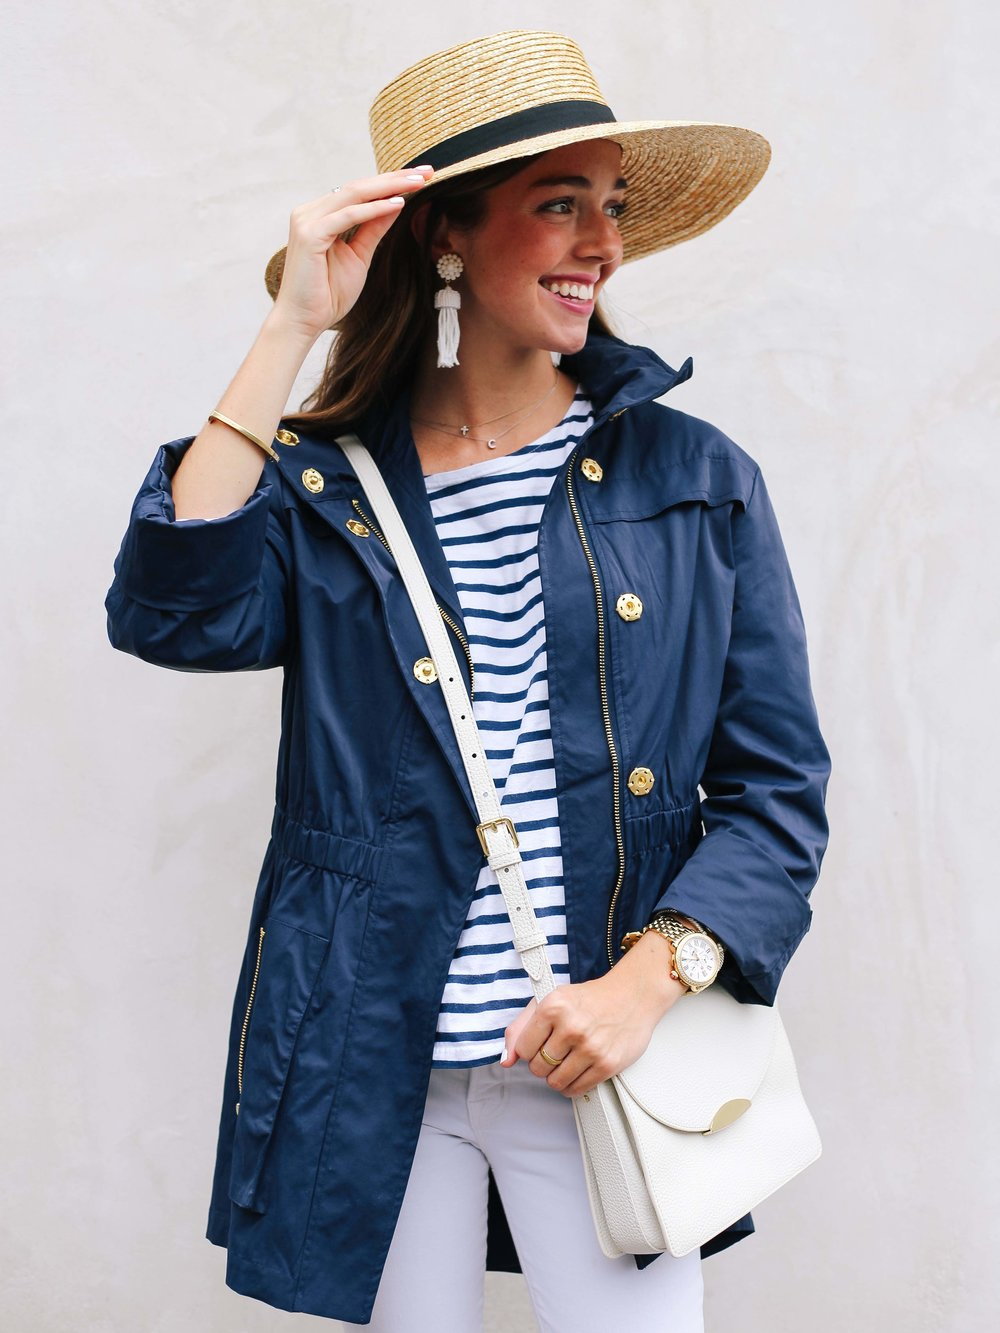 xxlcb style fashion blogger stripes chanel flats michele watch (27 of 39) copy.jpg